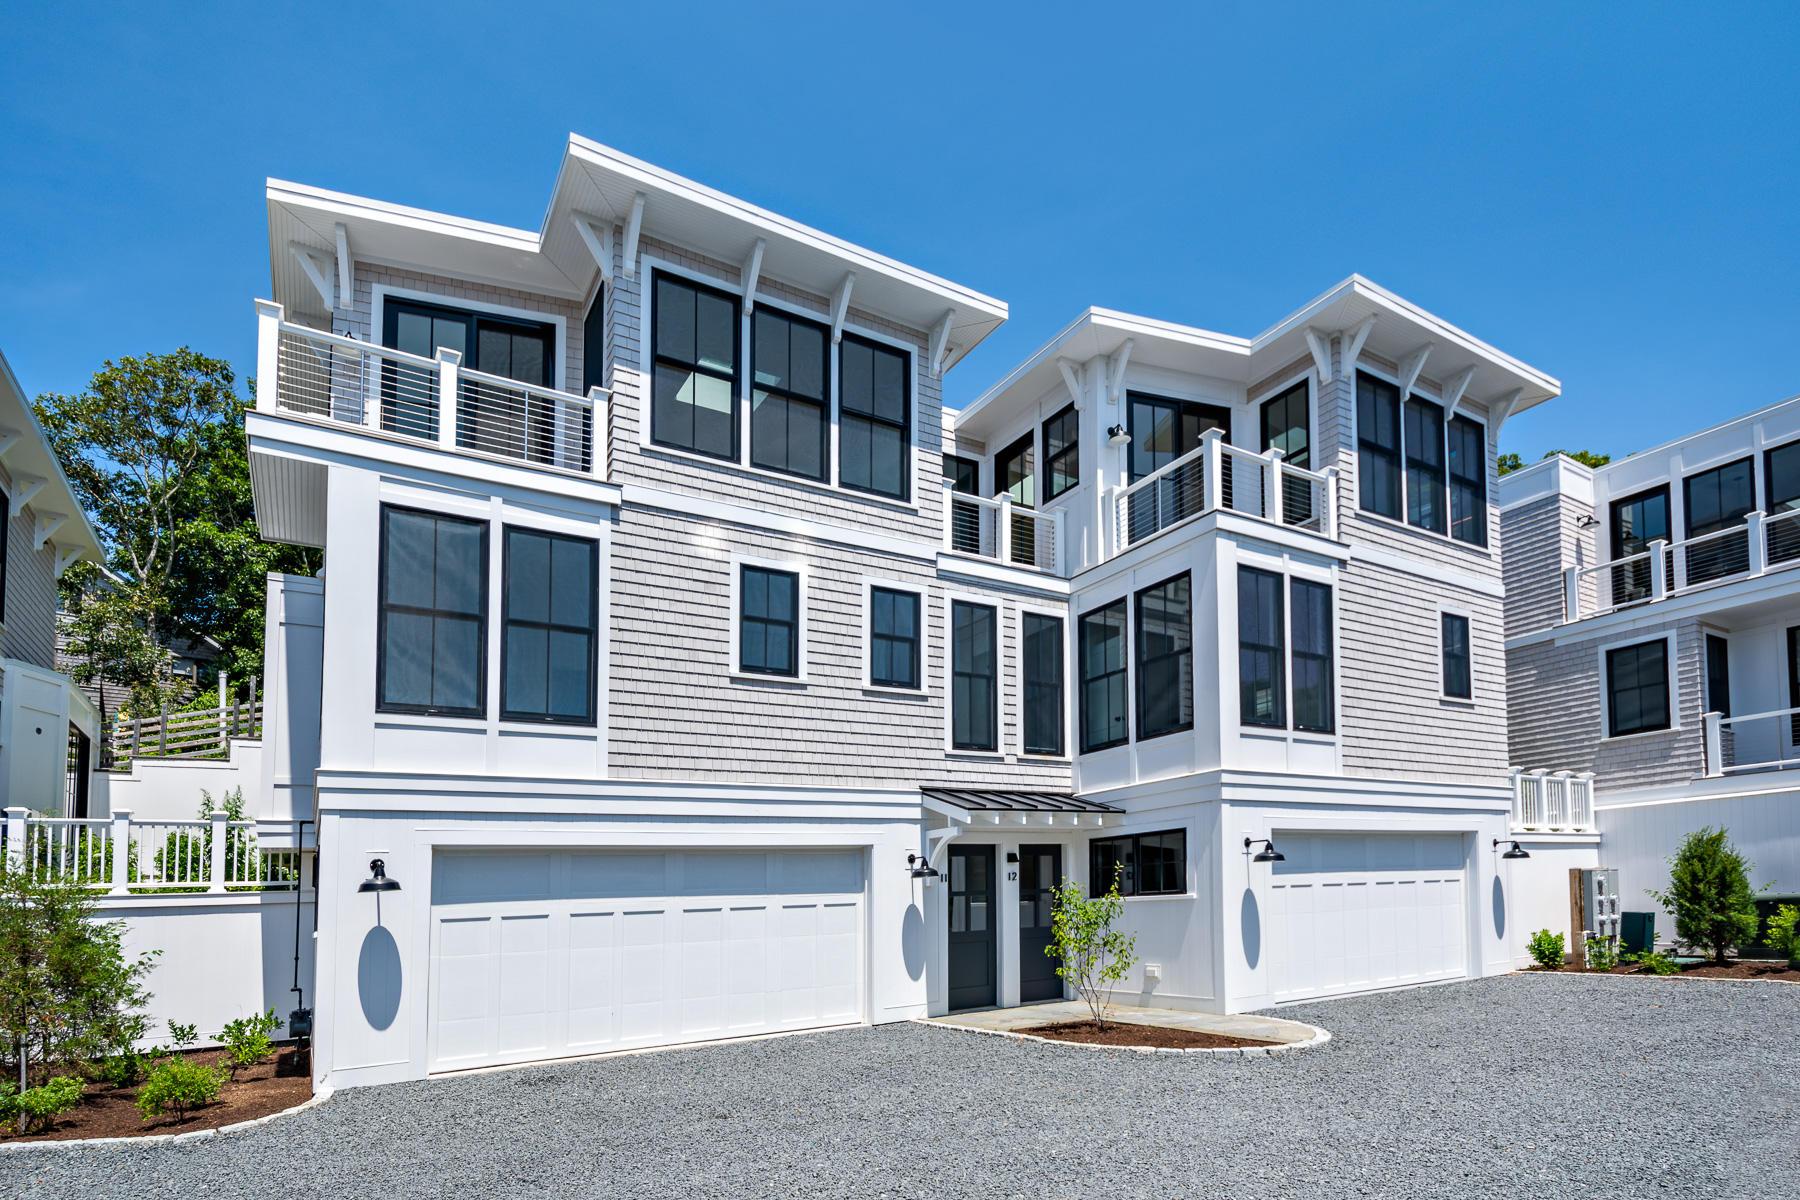 350 Bradford Street, Provincetown MA, 02657 details